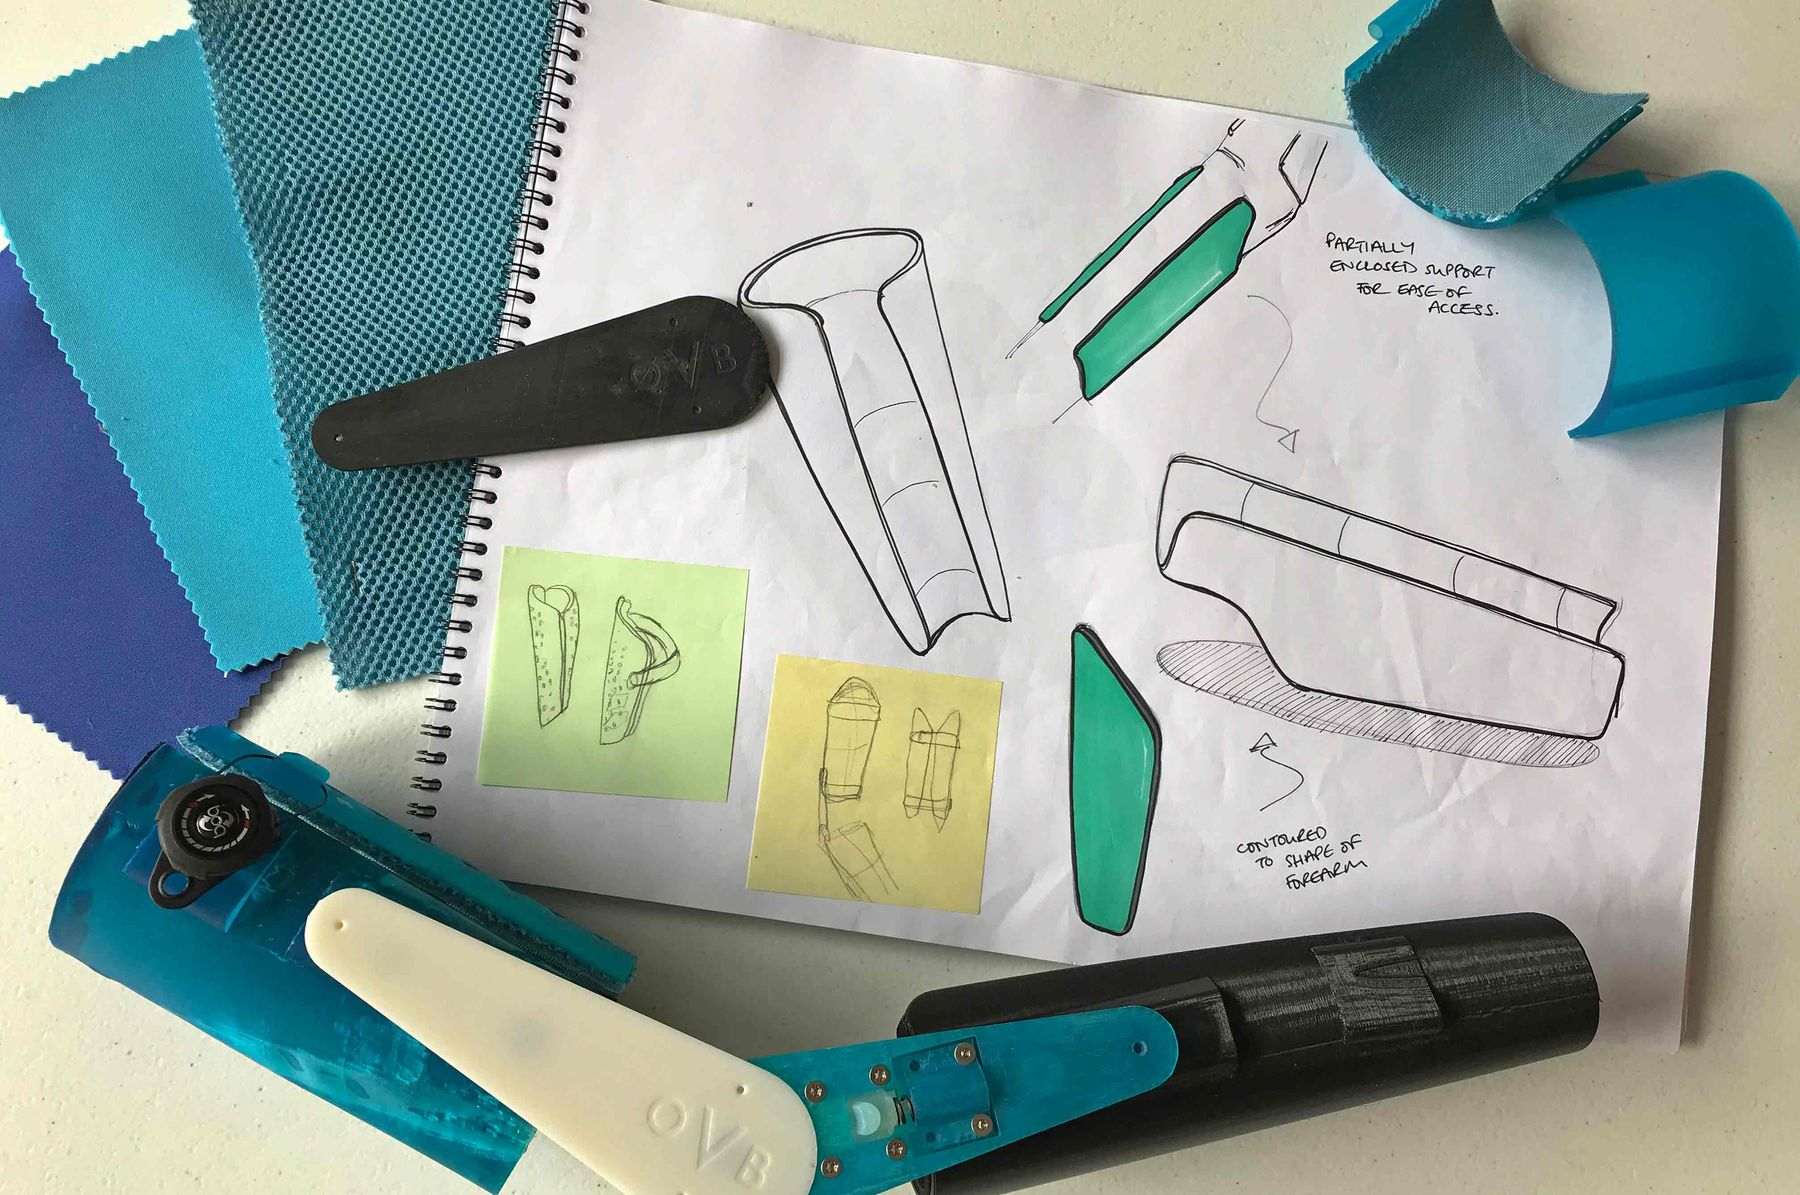 Olivia Killeya, OVB Brace Sketches, BSc Product Design, 2019